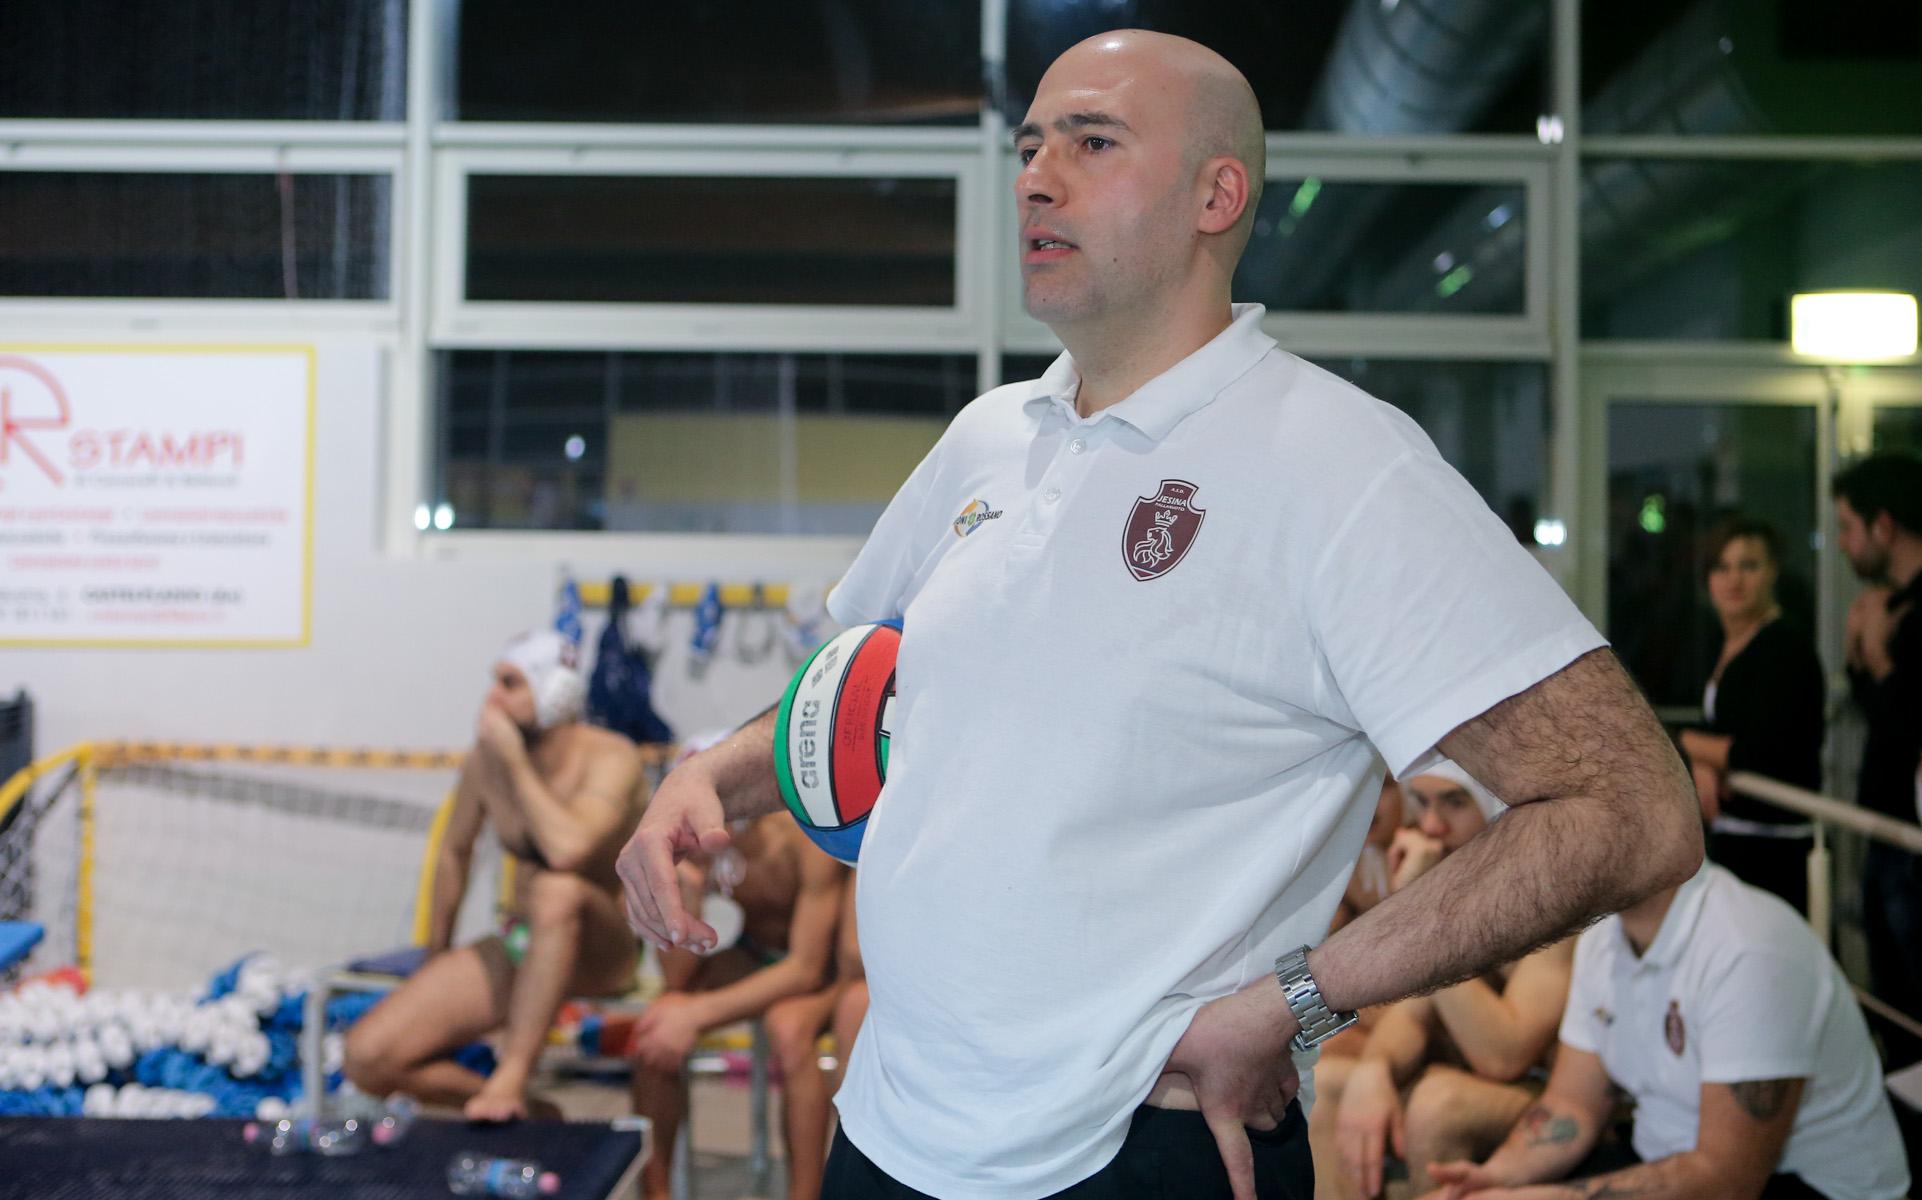 http://www.centropagina.it/wp-content/uploads/2017/03/Jesina-Pallanuoto-Pesaro-Giacomo-Iaricci-allenatore-Jesi-2.jpg